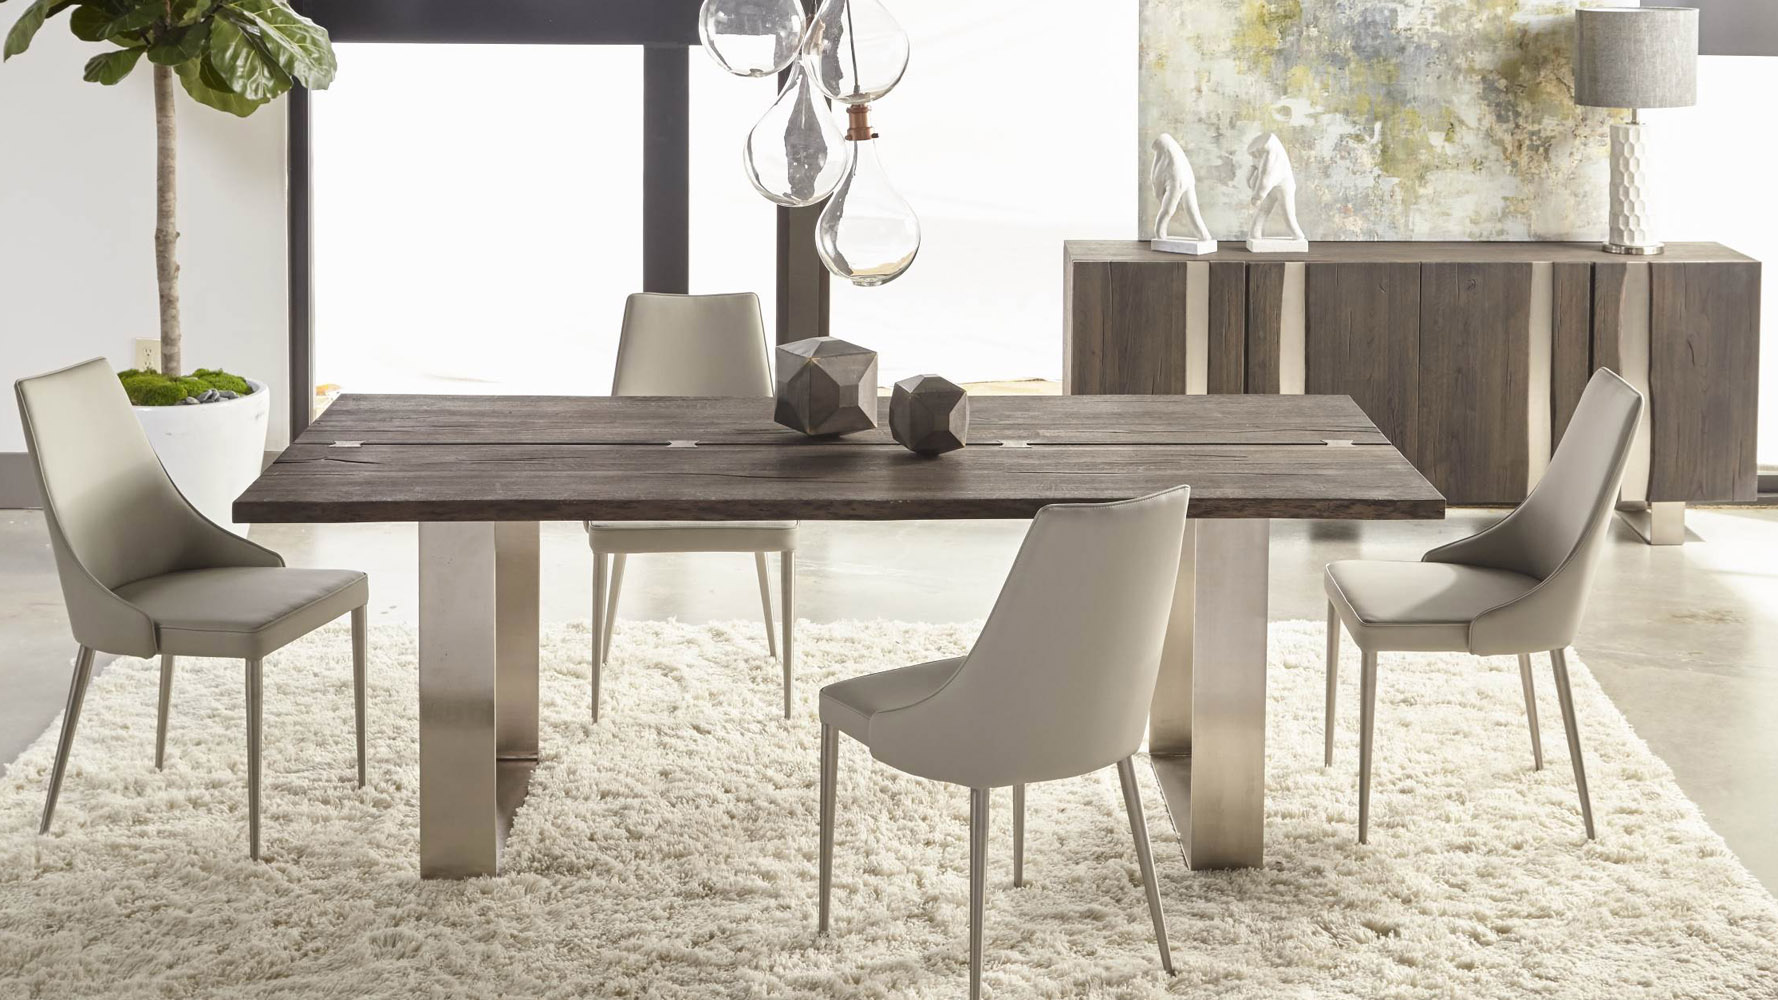 Blaize Rectangular Oak Dining Table With Nickel Base